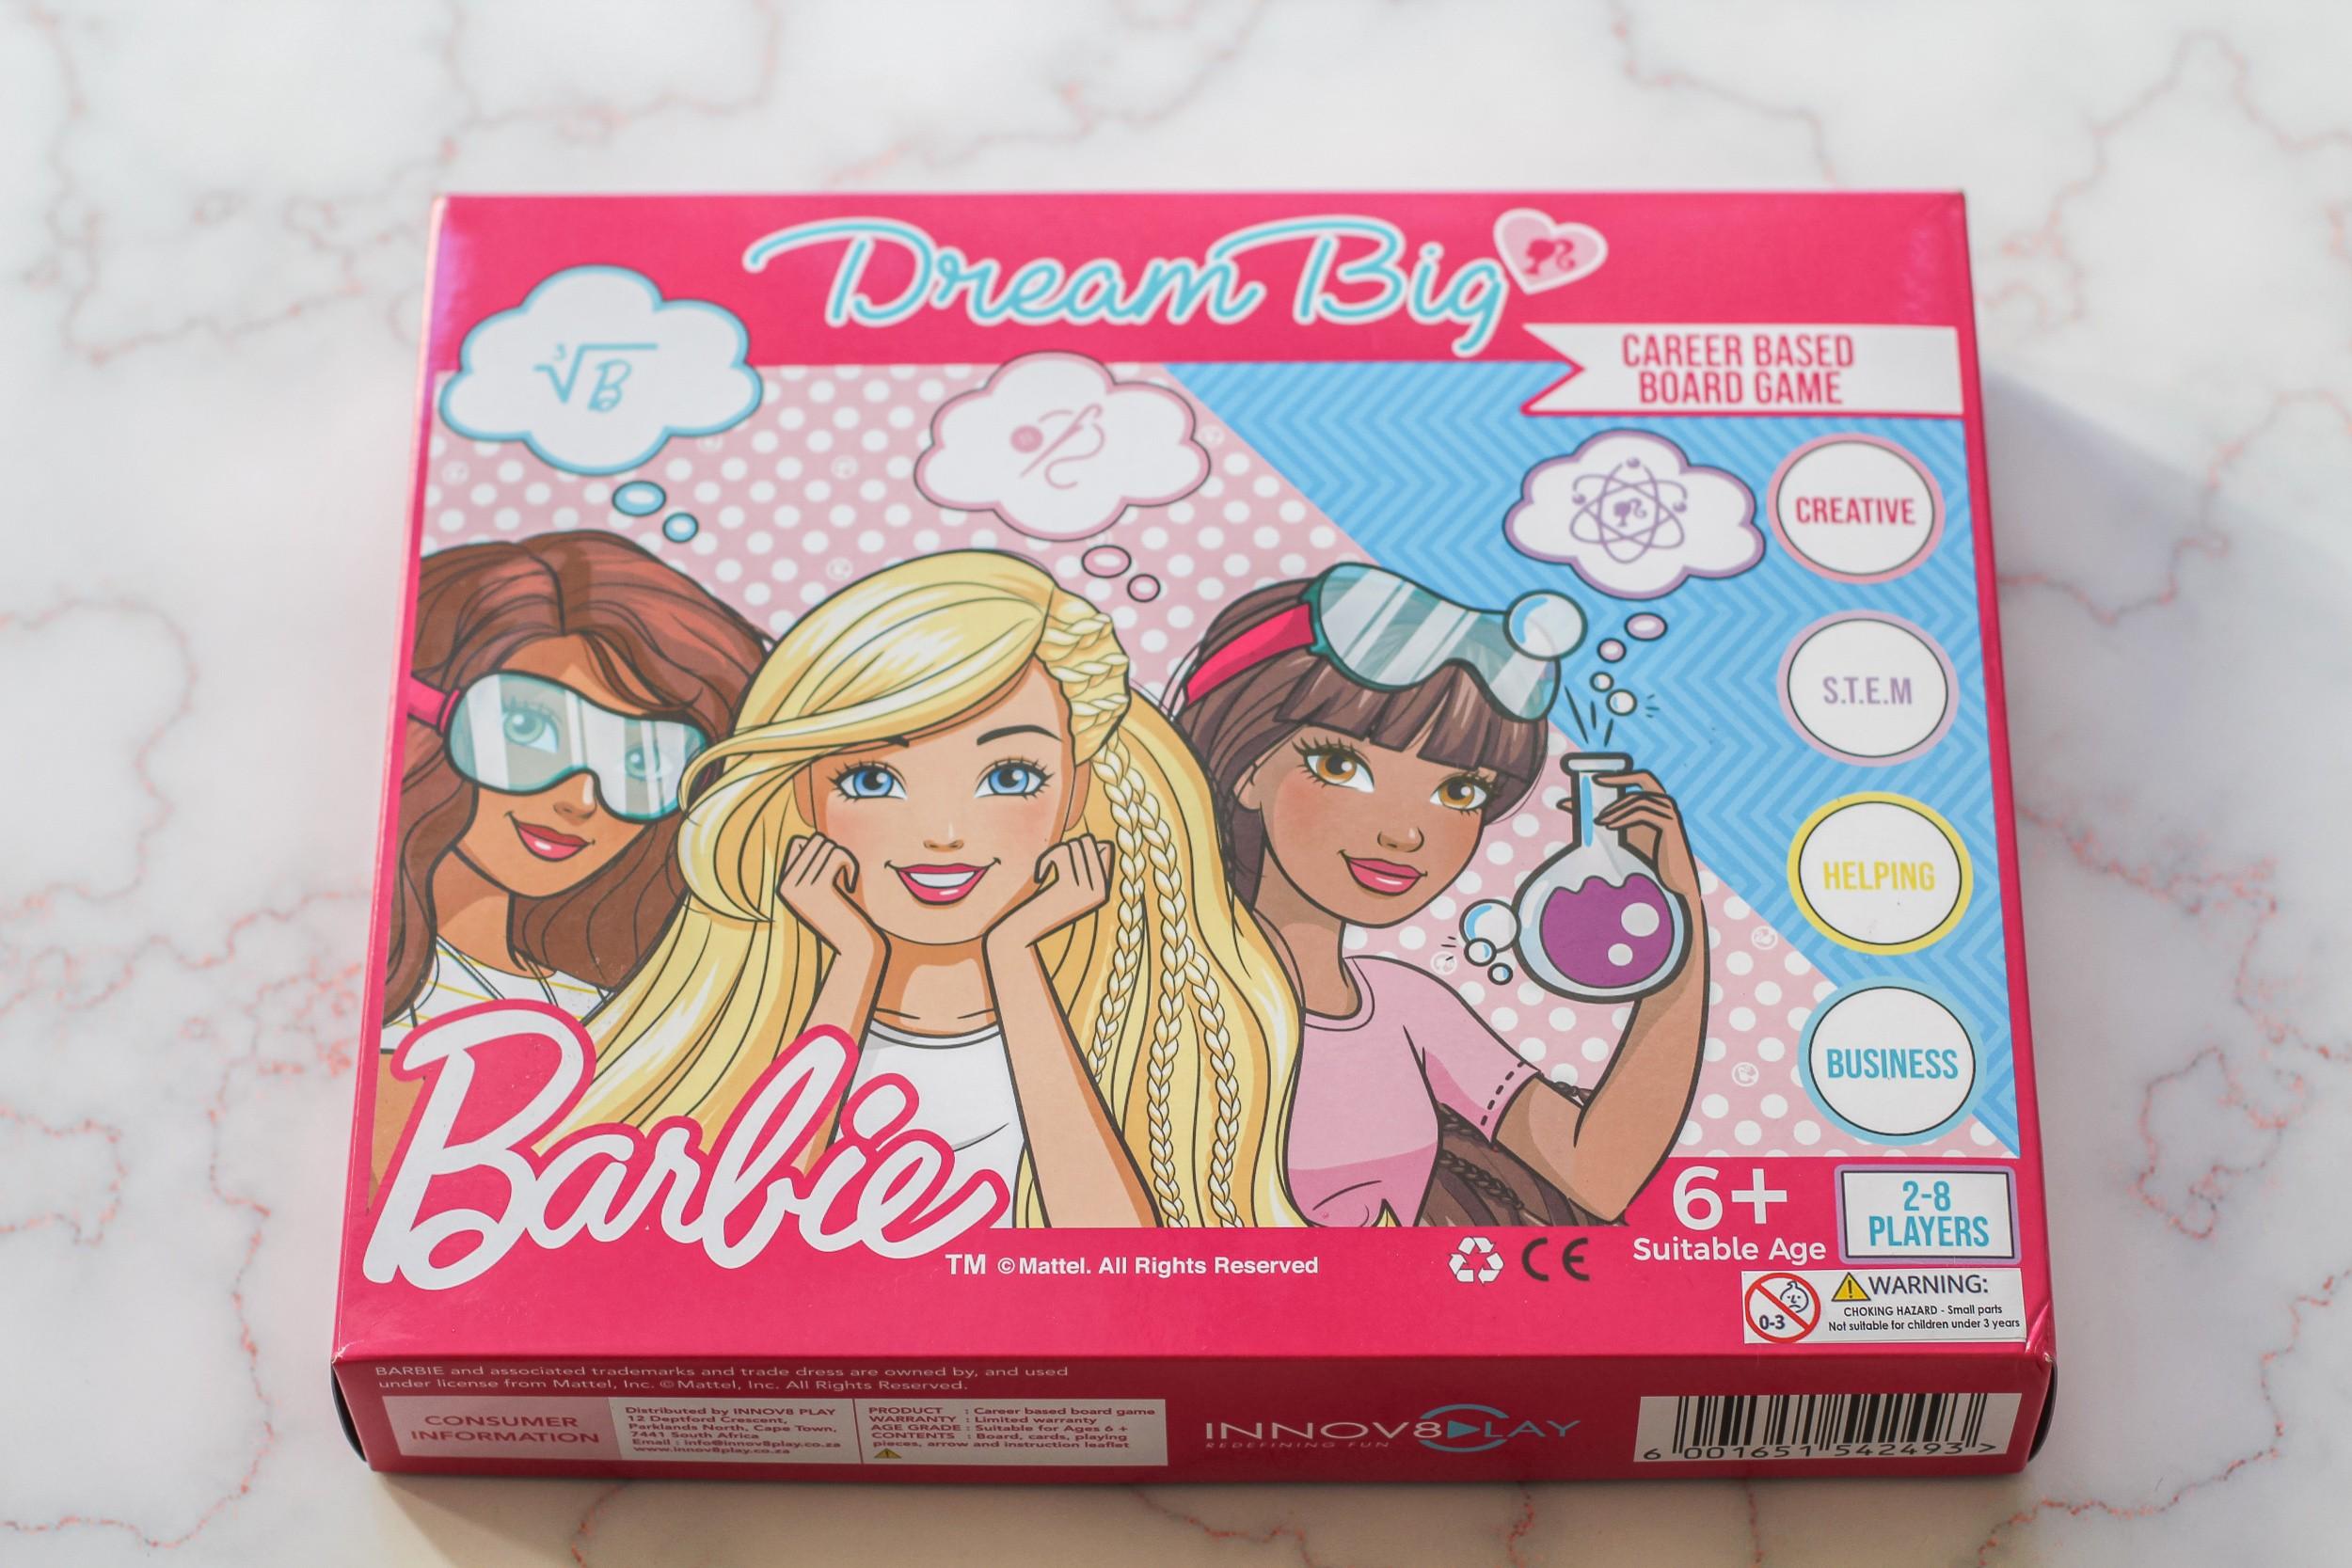 Barbie Dream Big Board Game Review